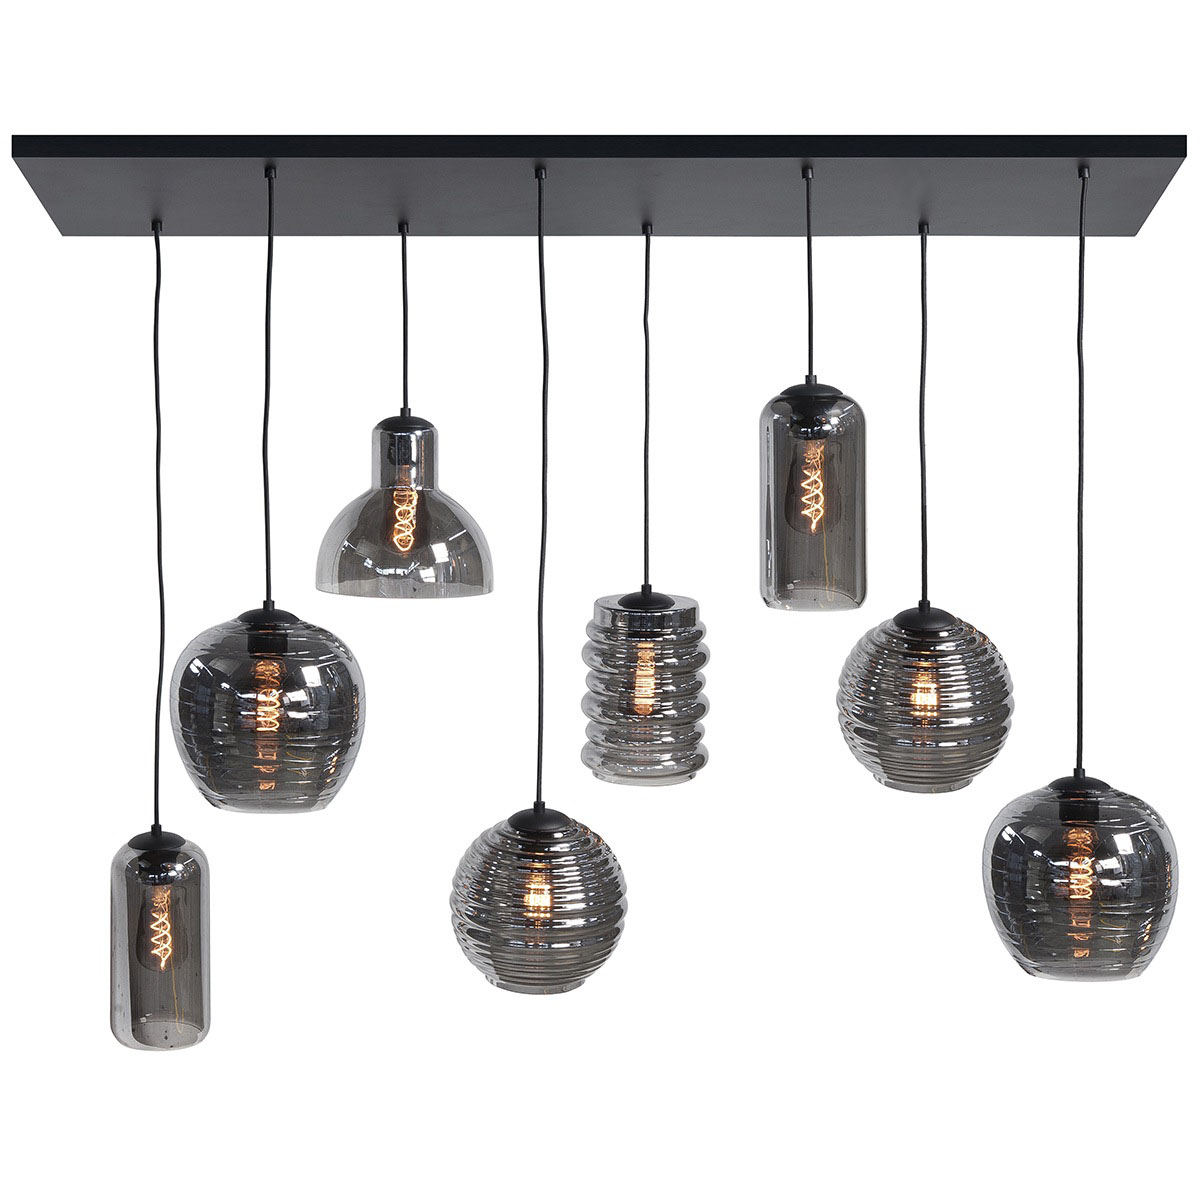 Hanglamp 130 cm. X 35 cm. lichts 8 X E27 Fantasy + glas Smoke